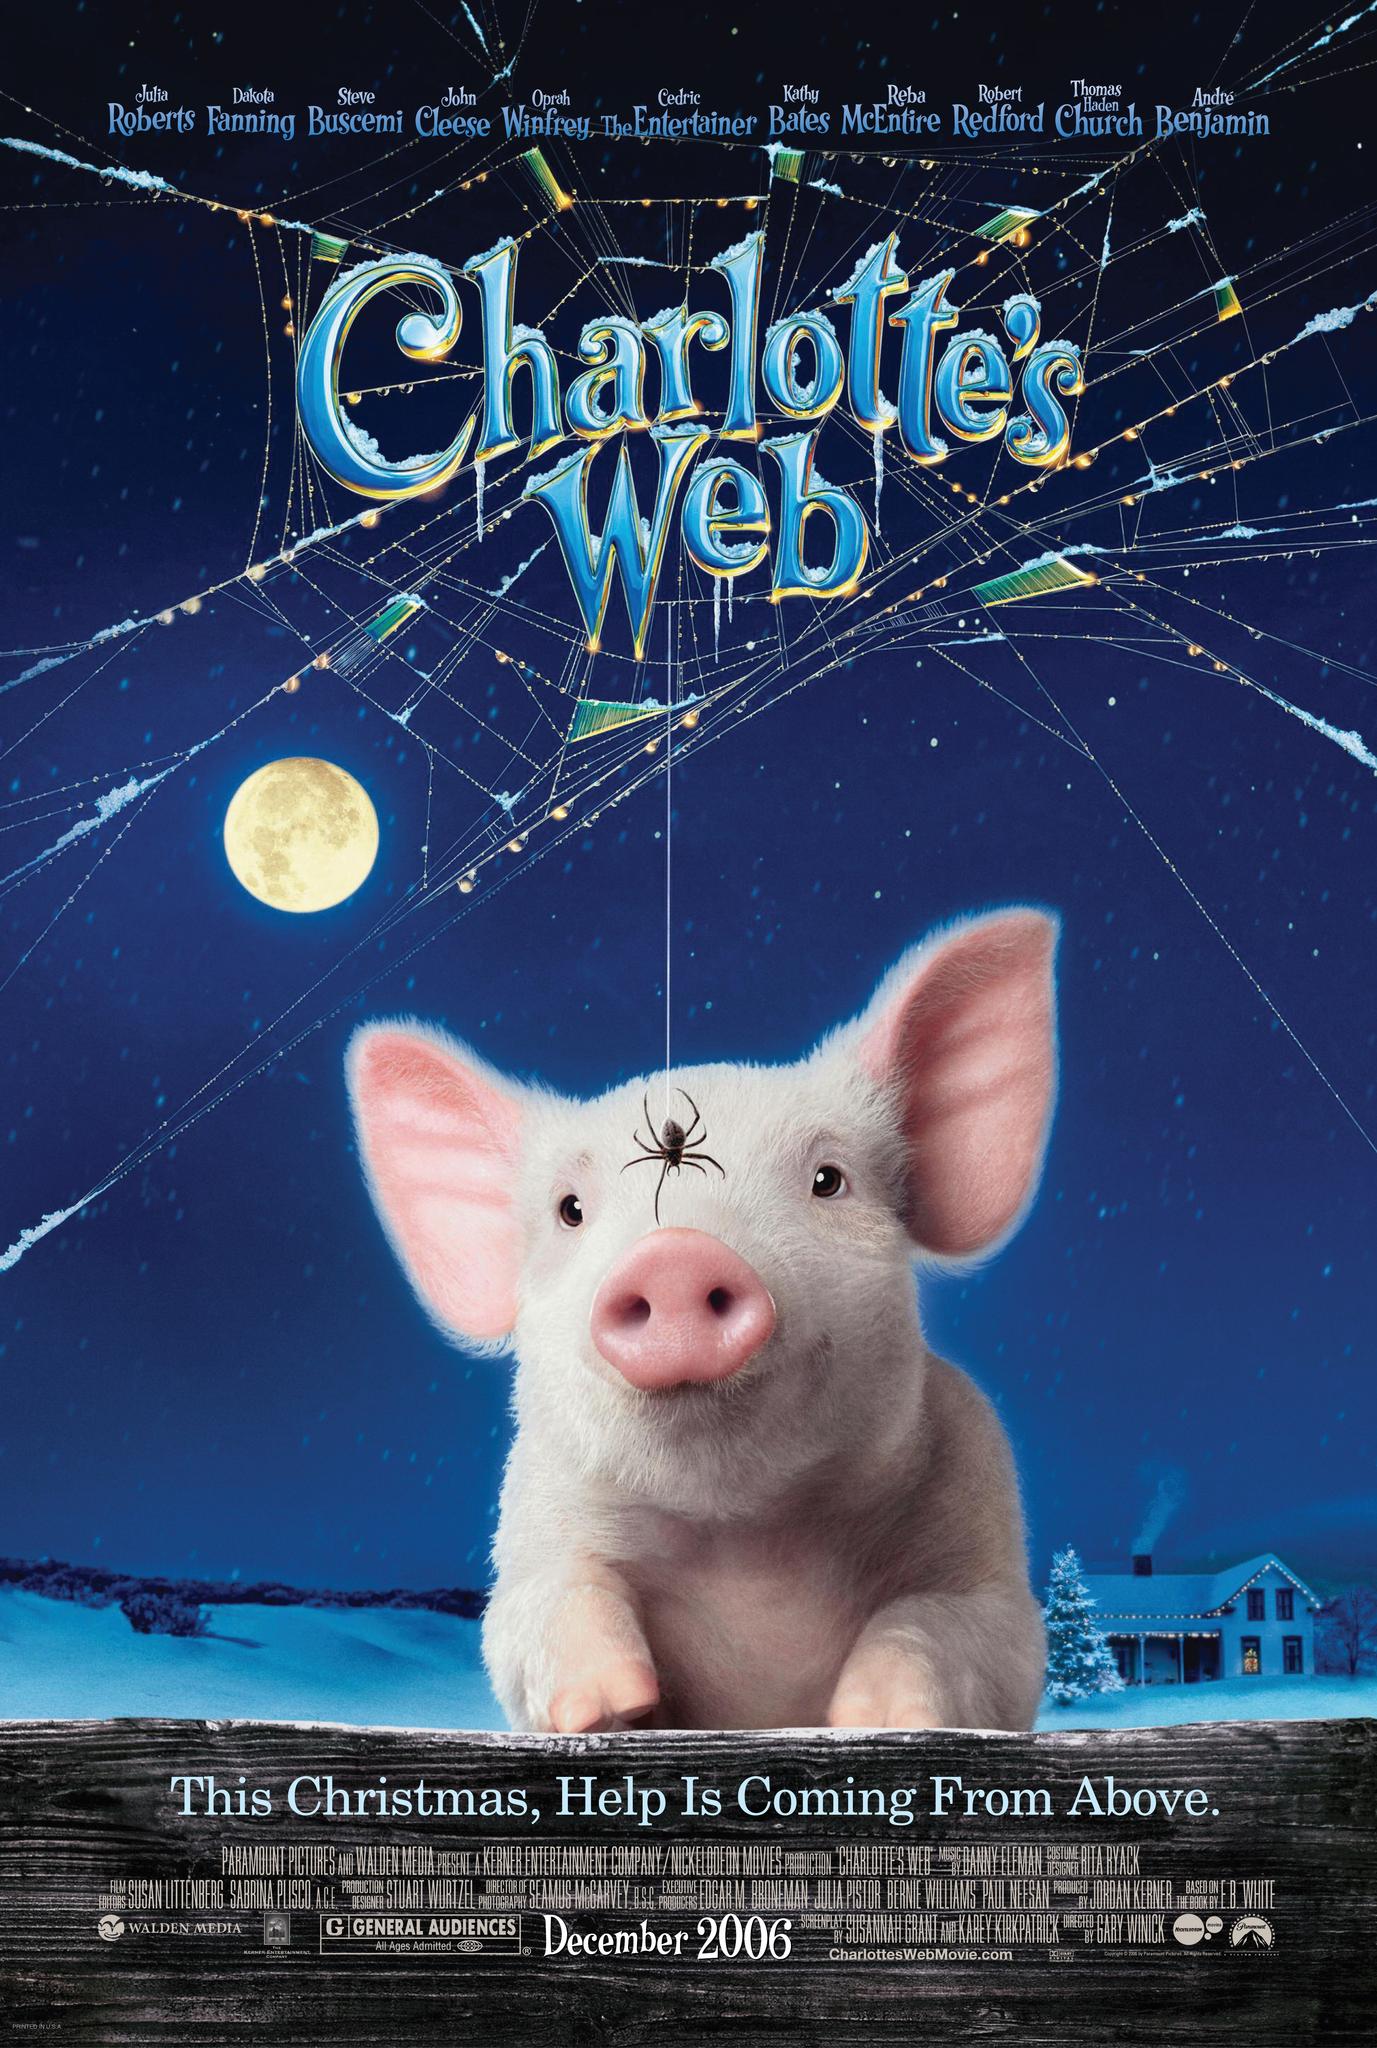 FAMILY FILM: CHARLOTTE'S WEB (U)